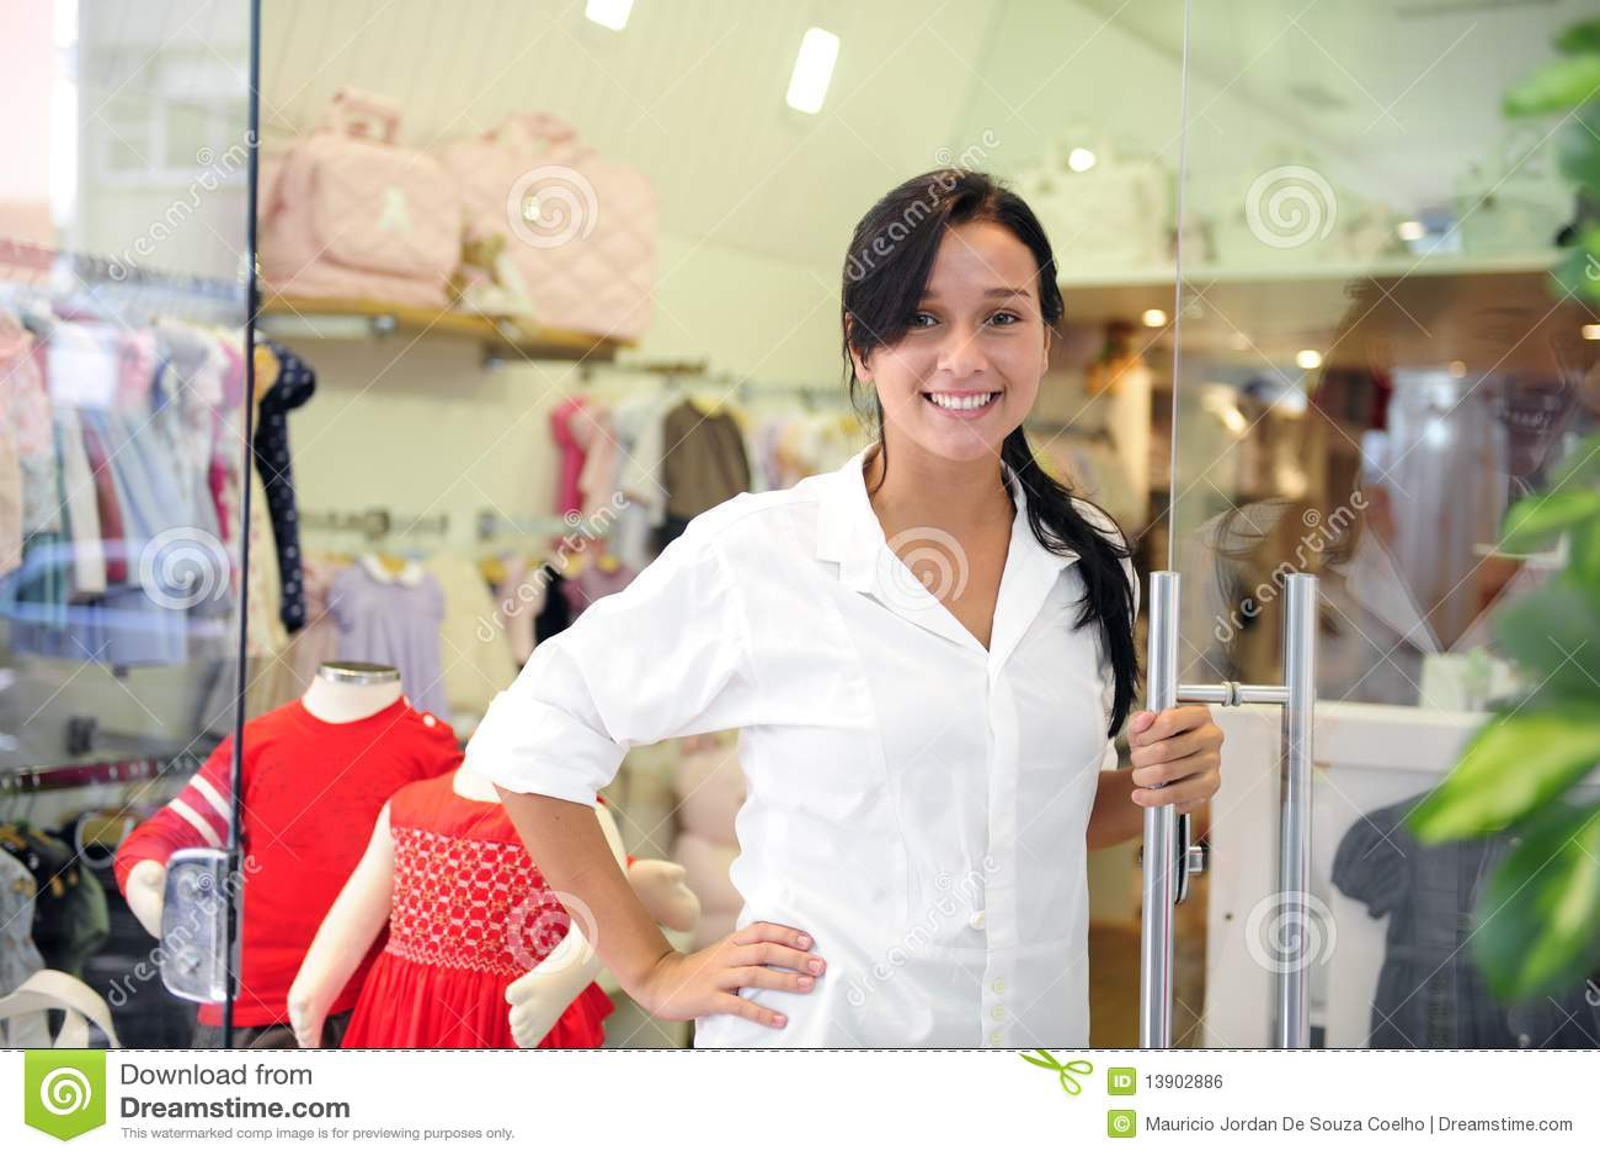 Kleine bedrijfseigenaar: trotse vrouw